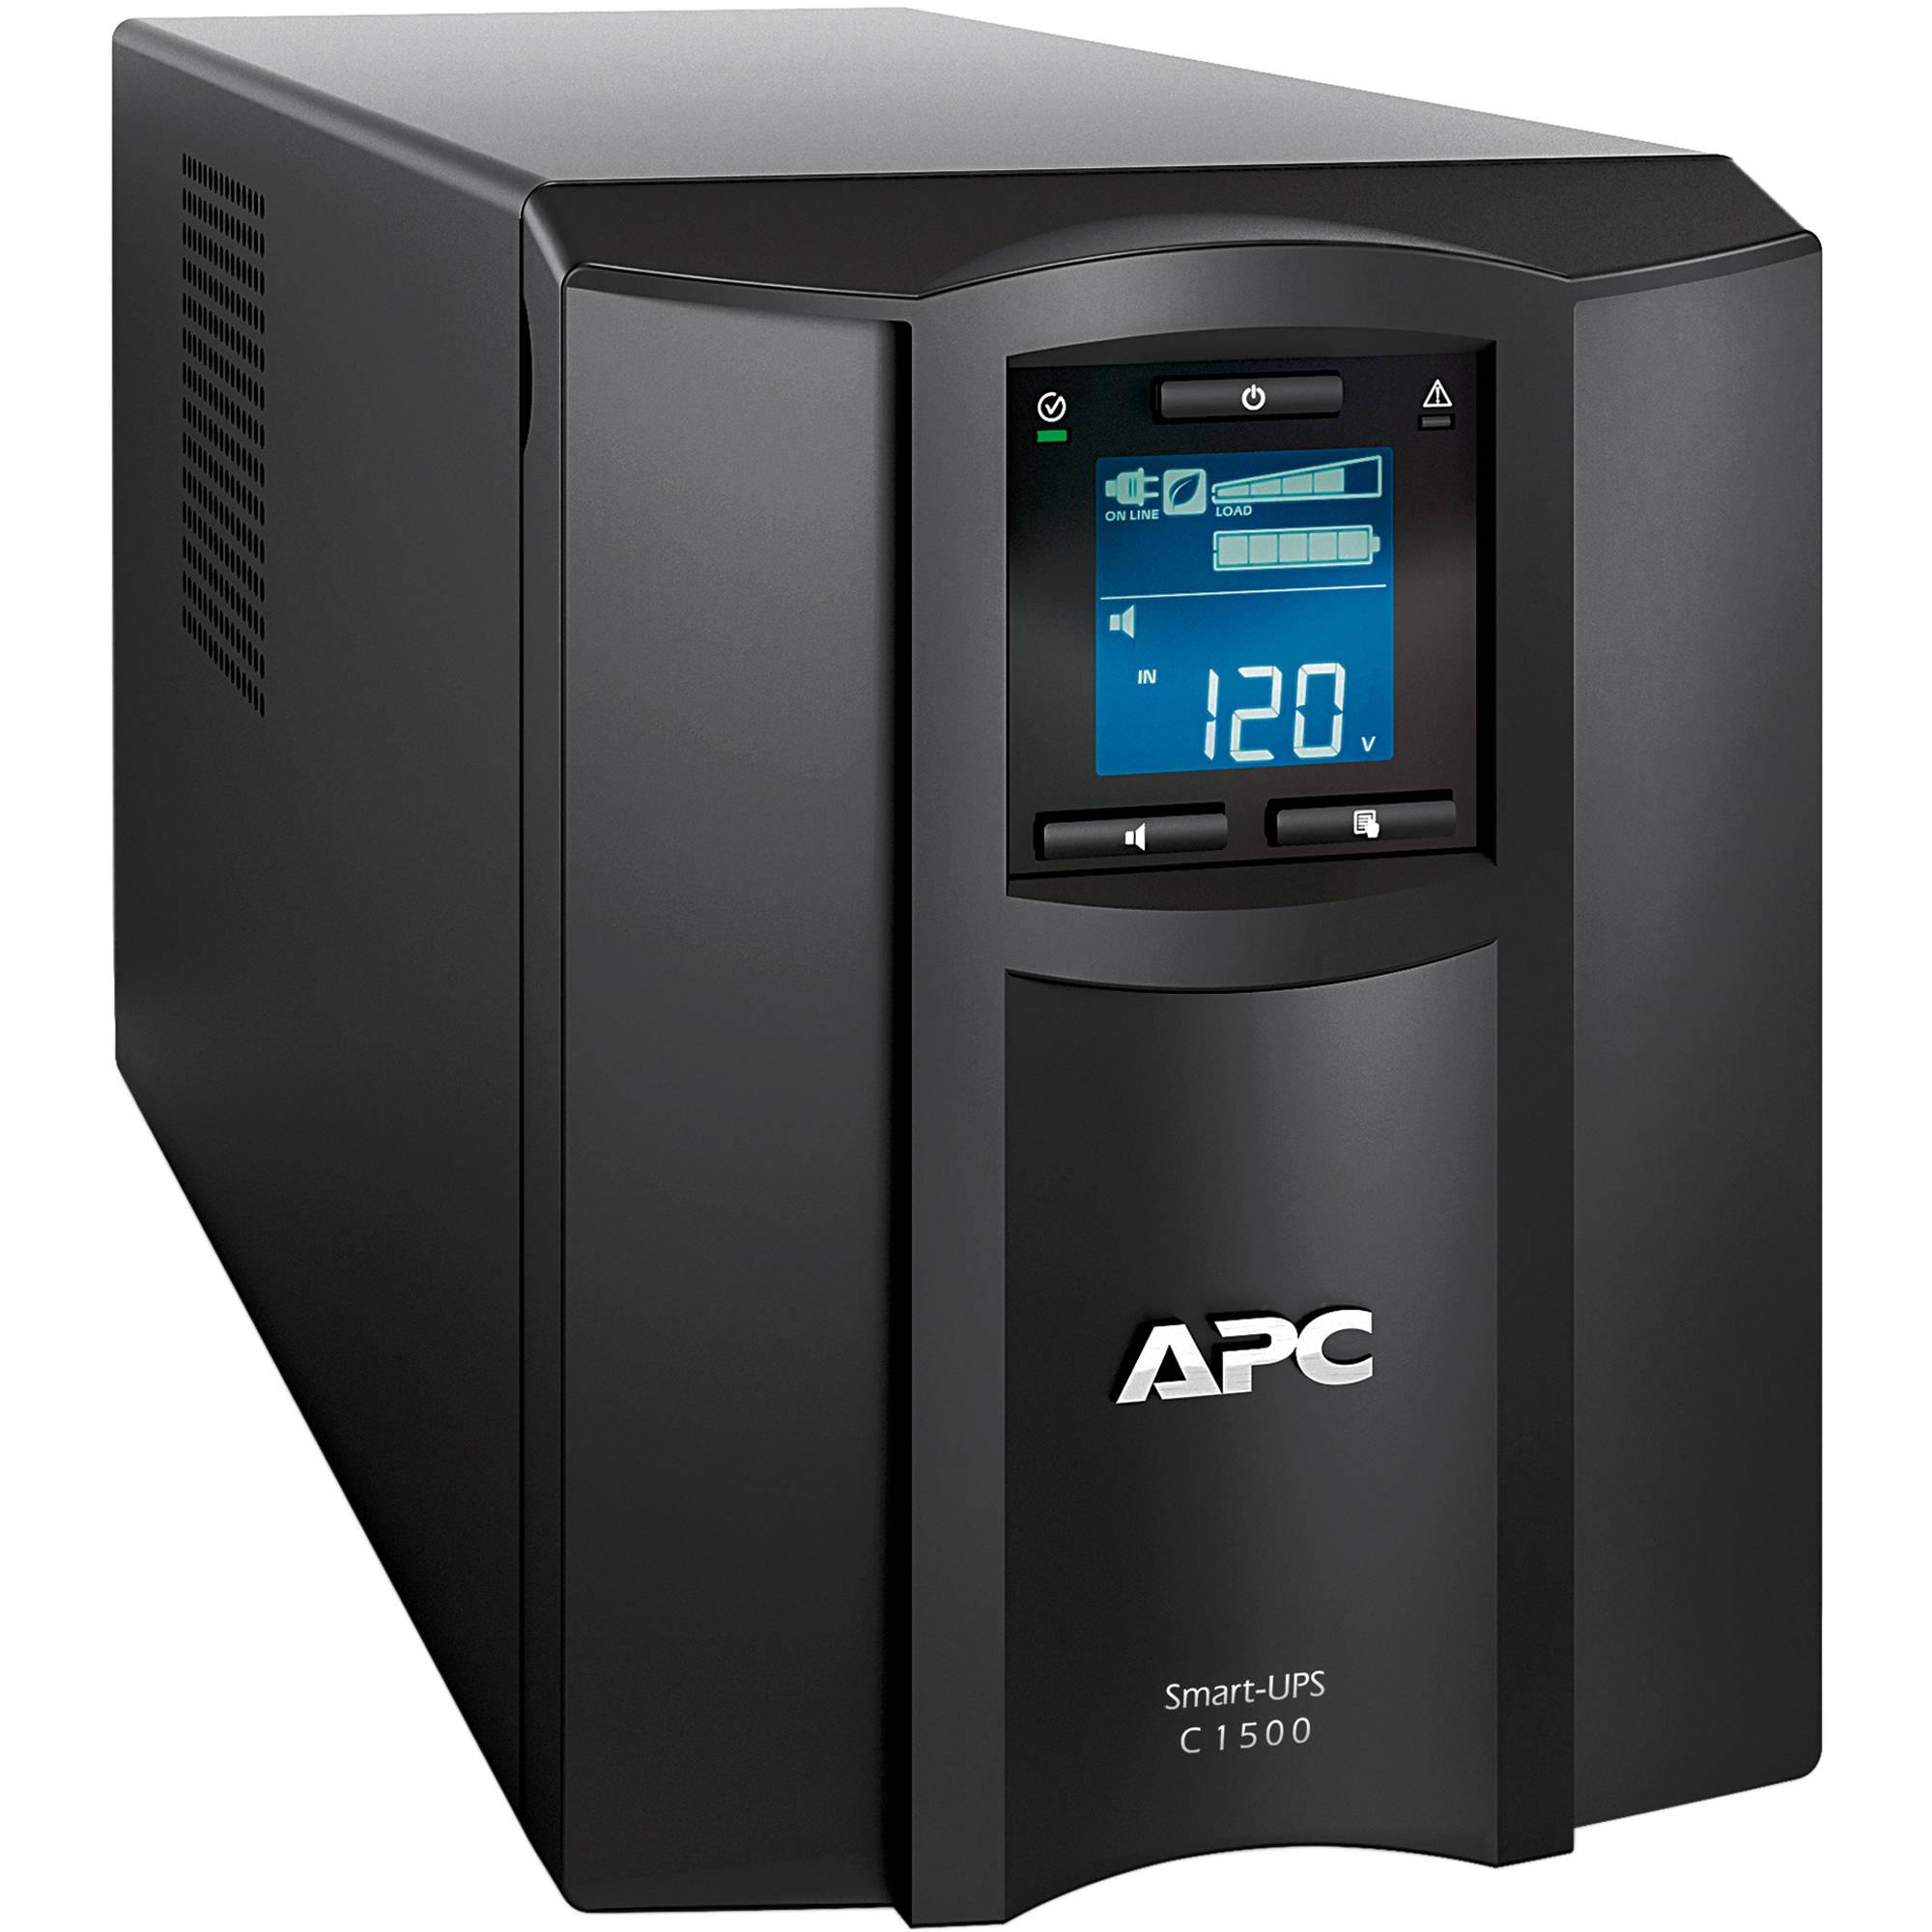 UPC 1500 VA Intelligent LCD UPS Tower Battery Backup Computer Surge Protector